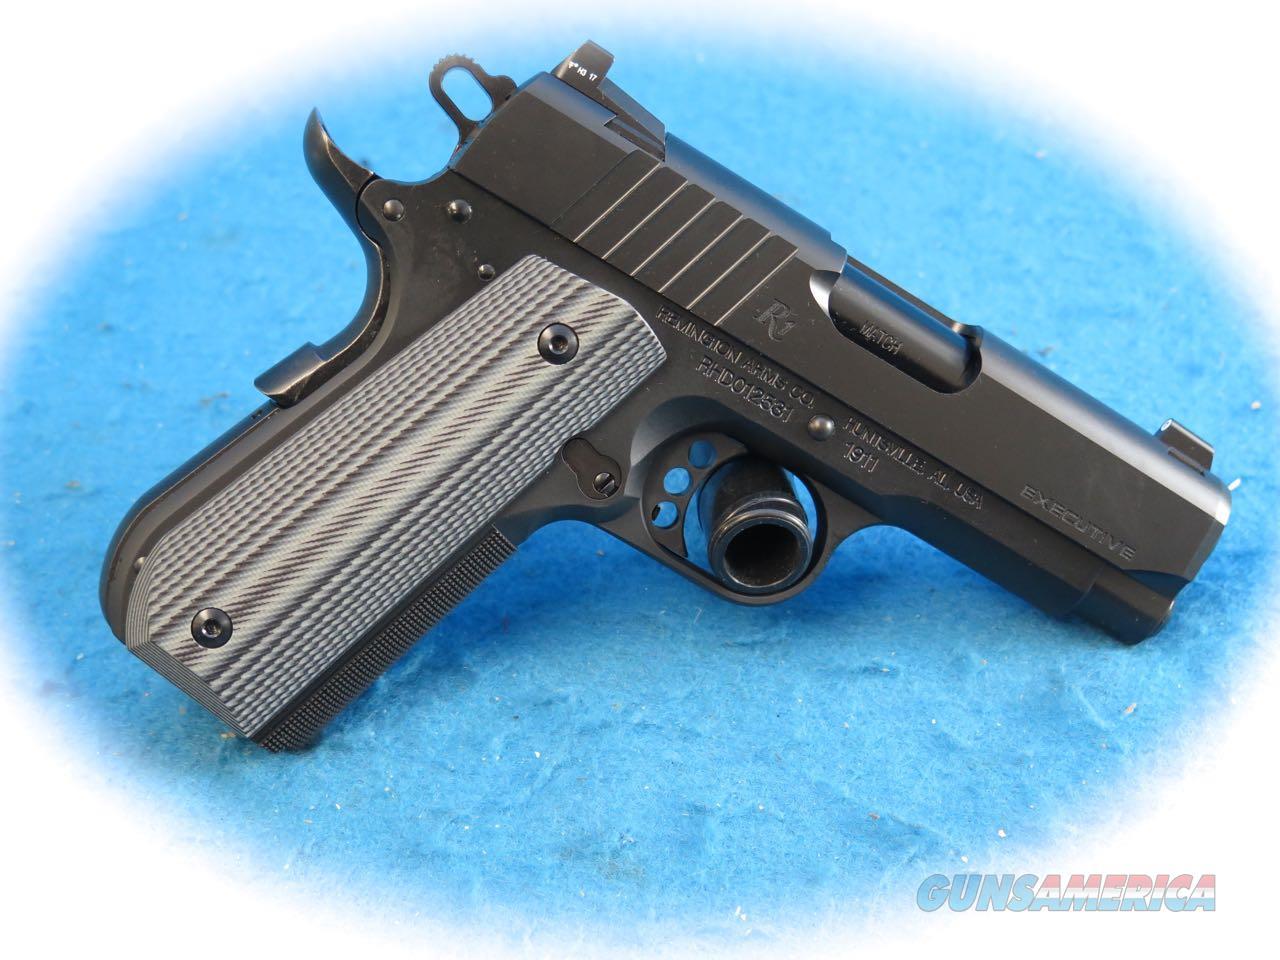 Remington 1911 R1 UL Executive .45 ACP Pistol Model 96493 **New**  Guns > Pistols > Remington Pistols - Modern > 1911